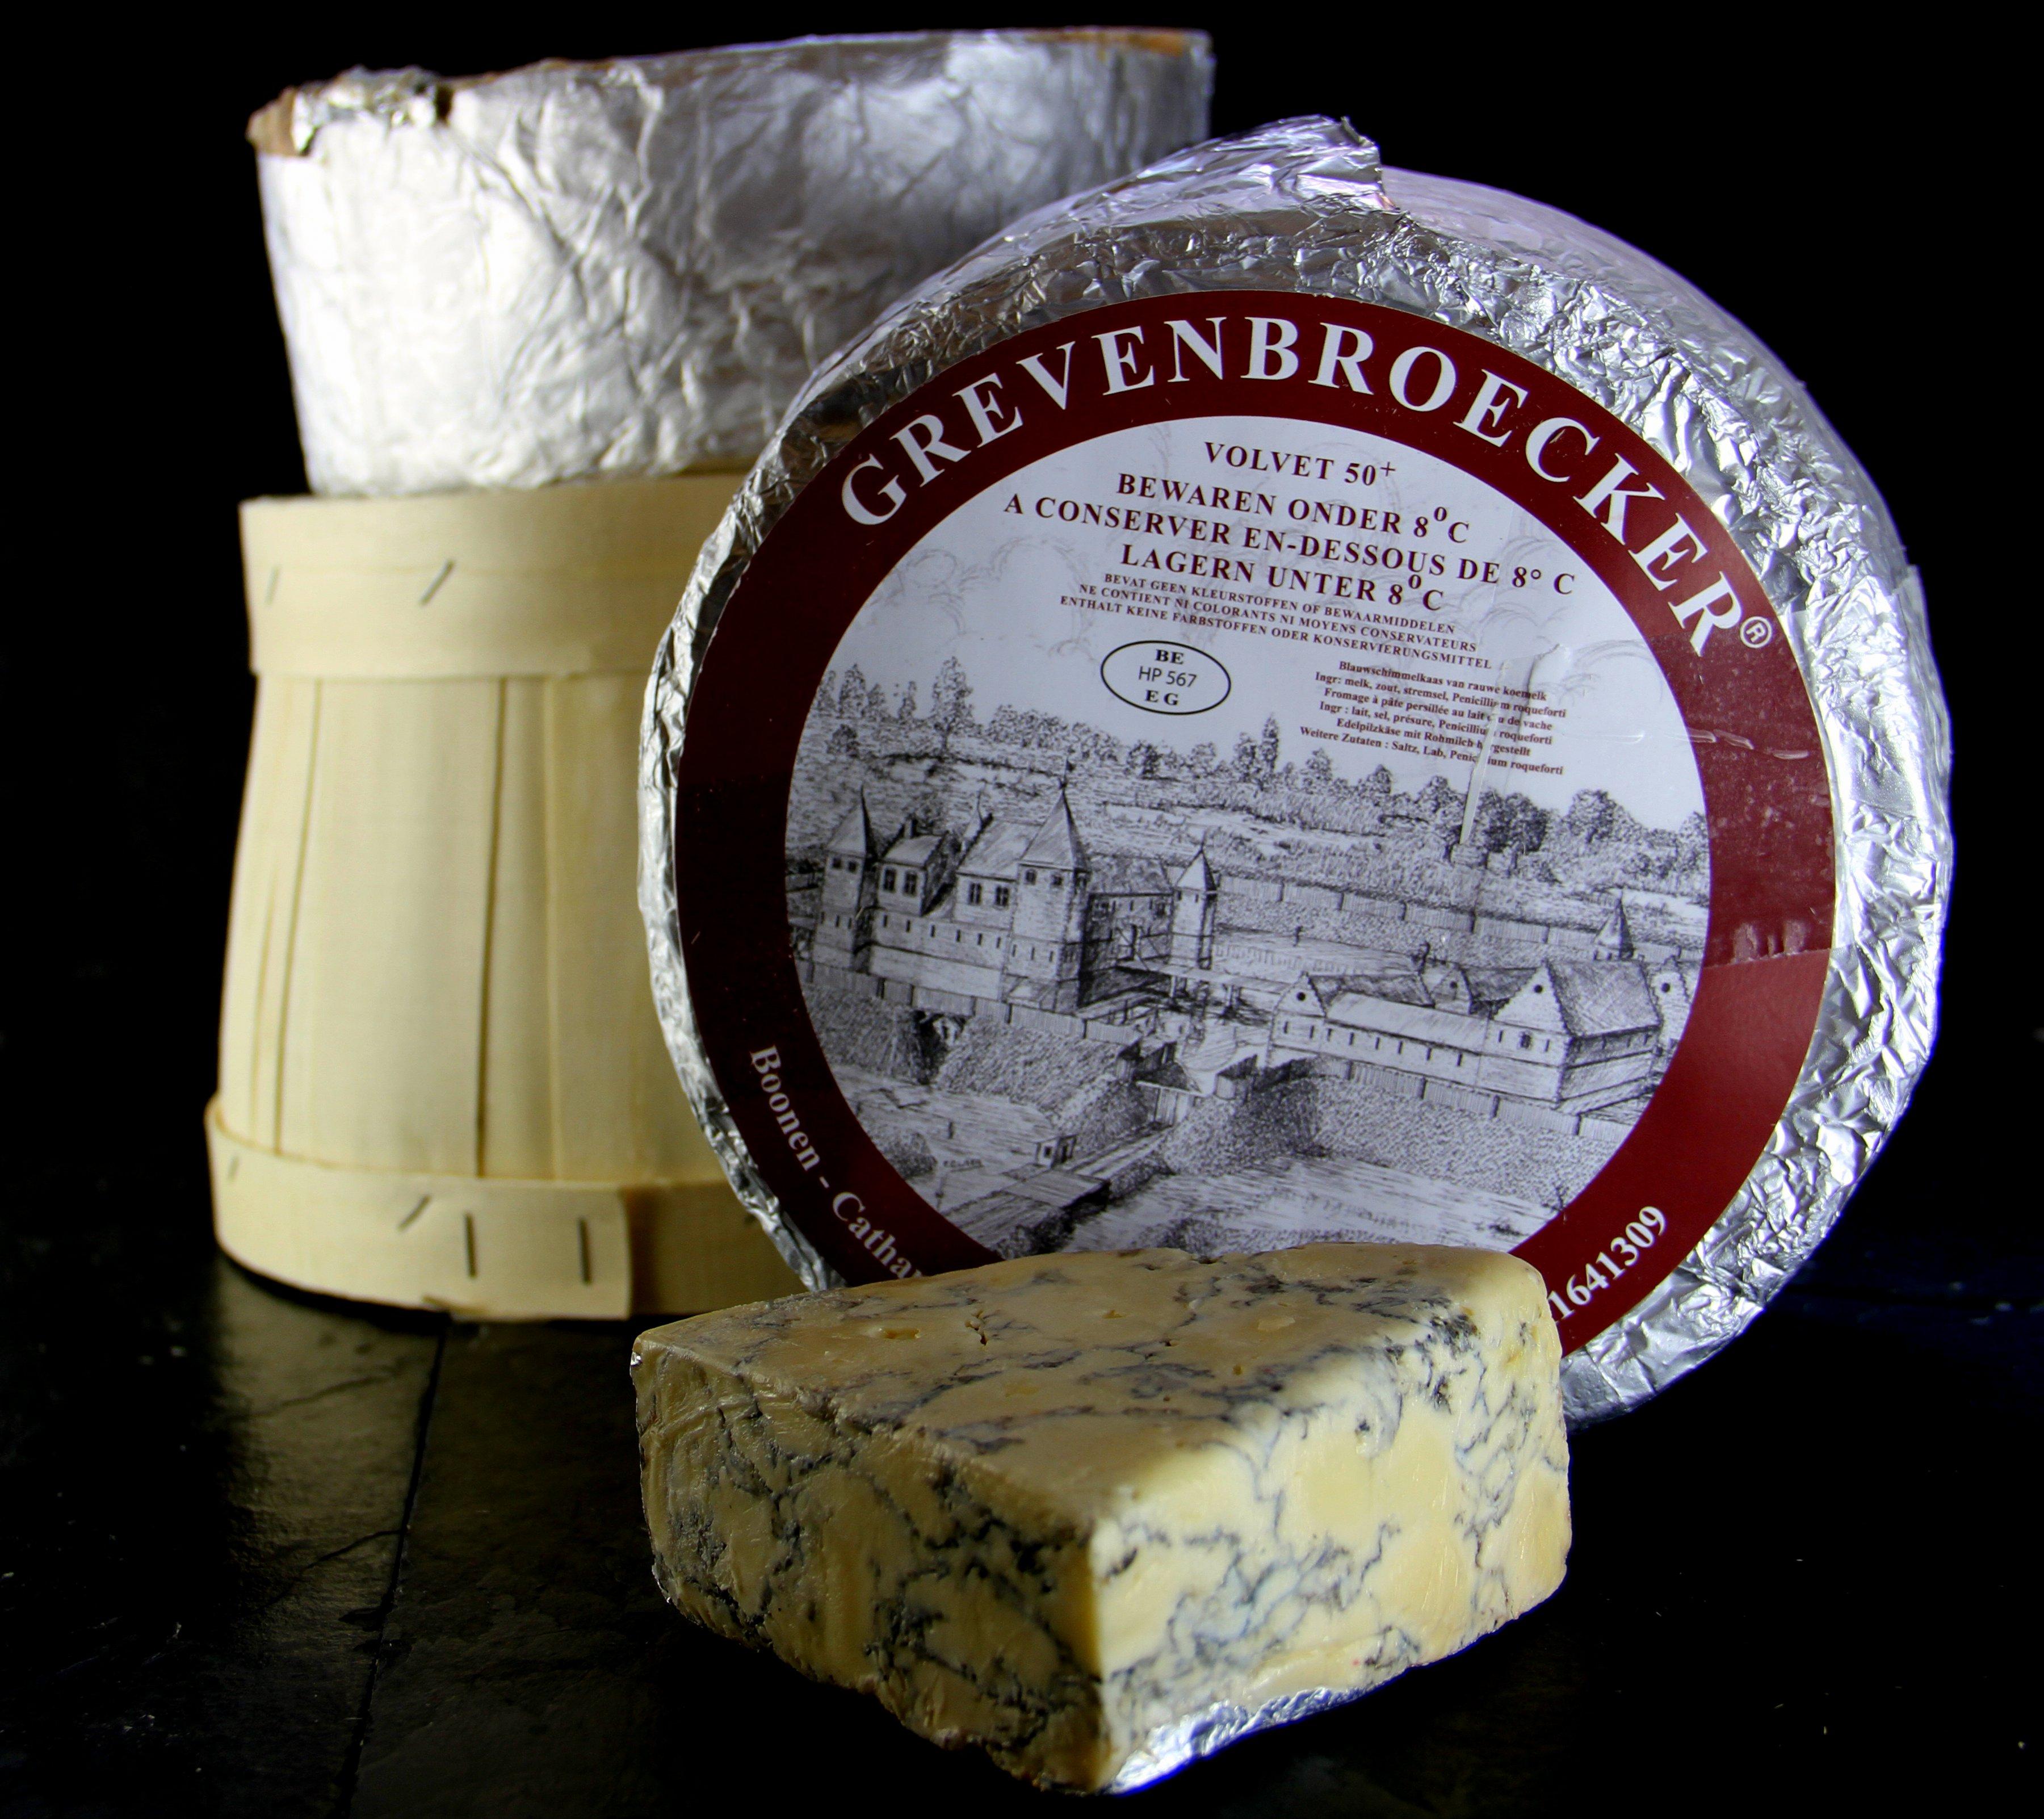 Grevenbroecker, Belgium stackedcurd blue cheese